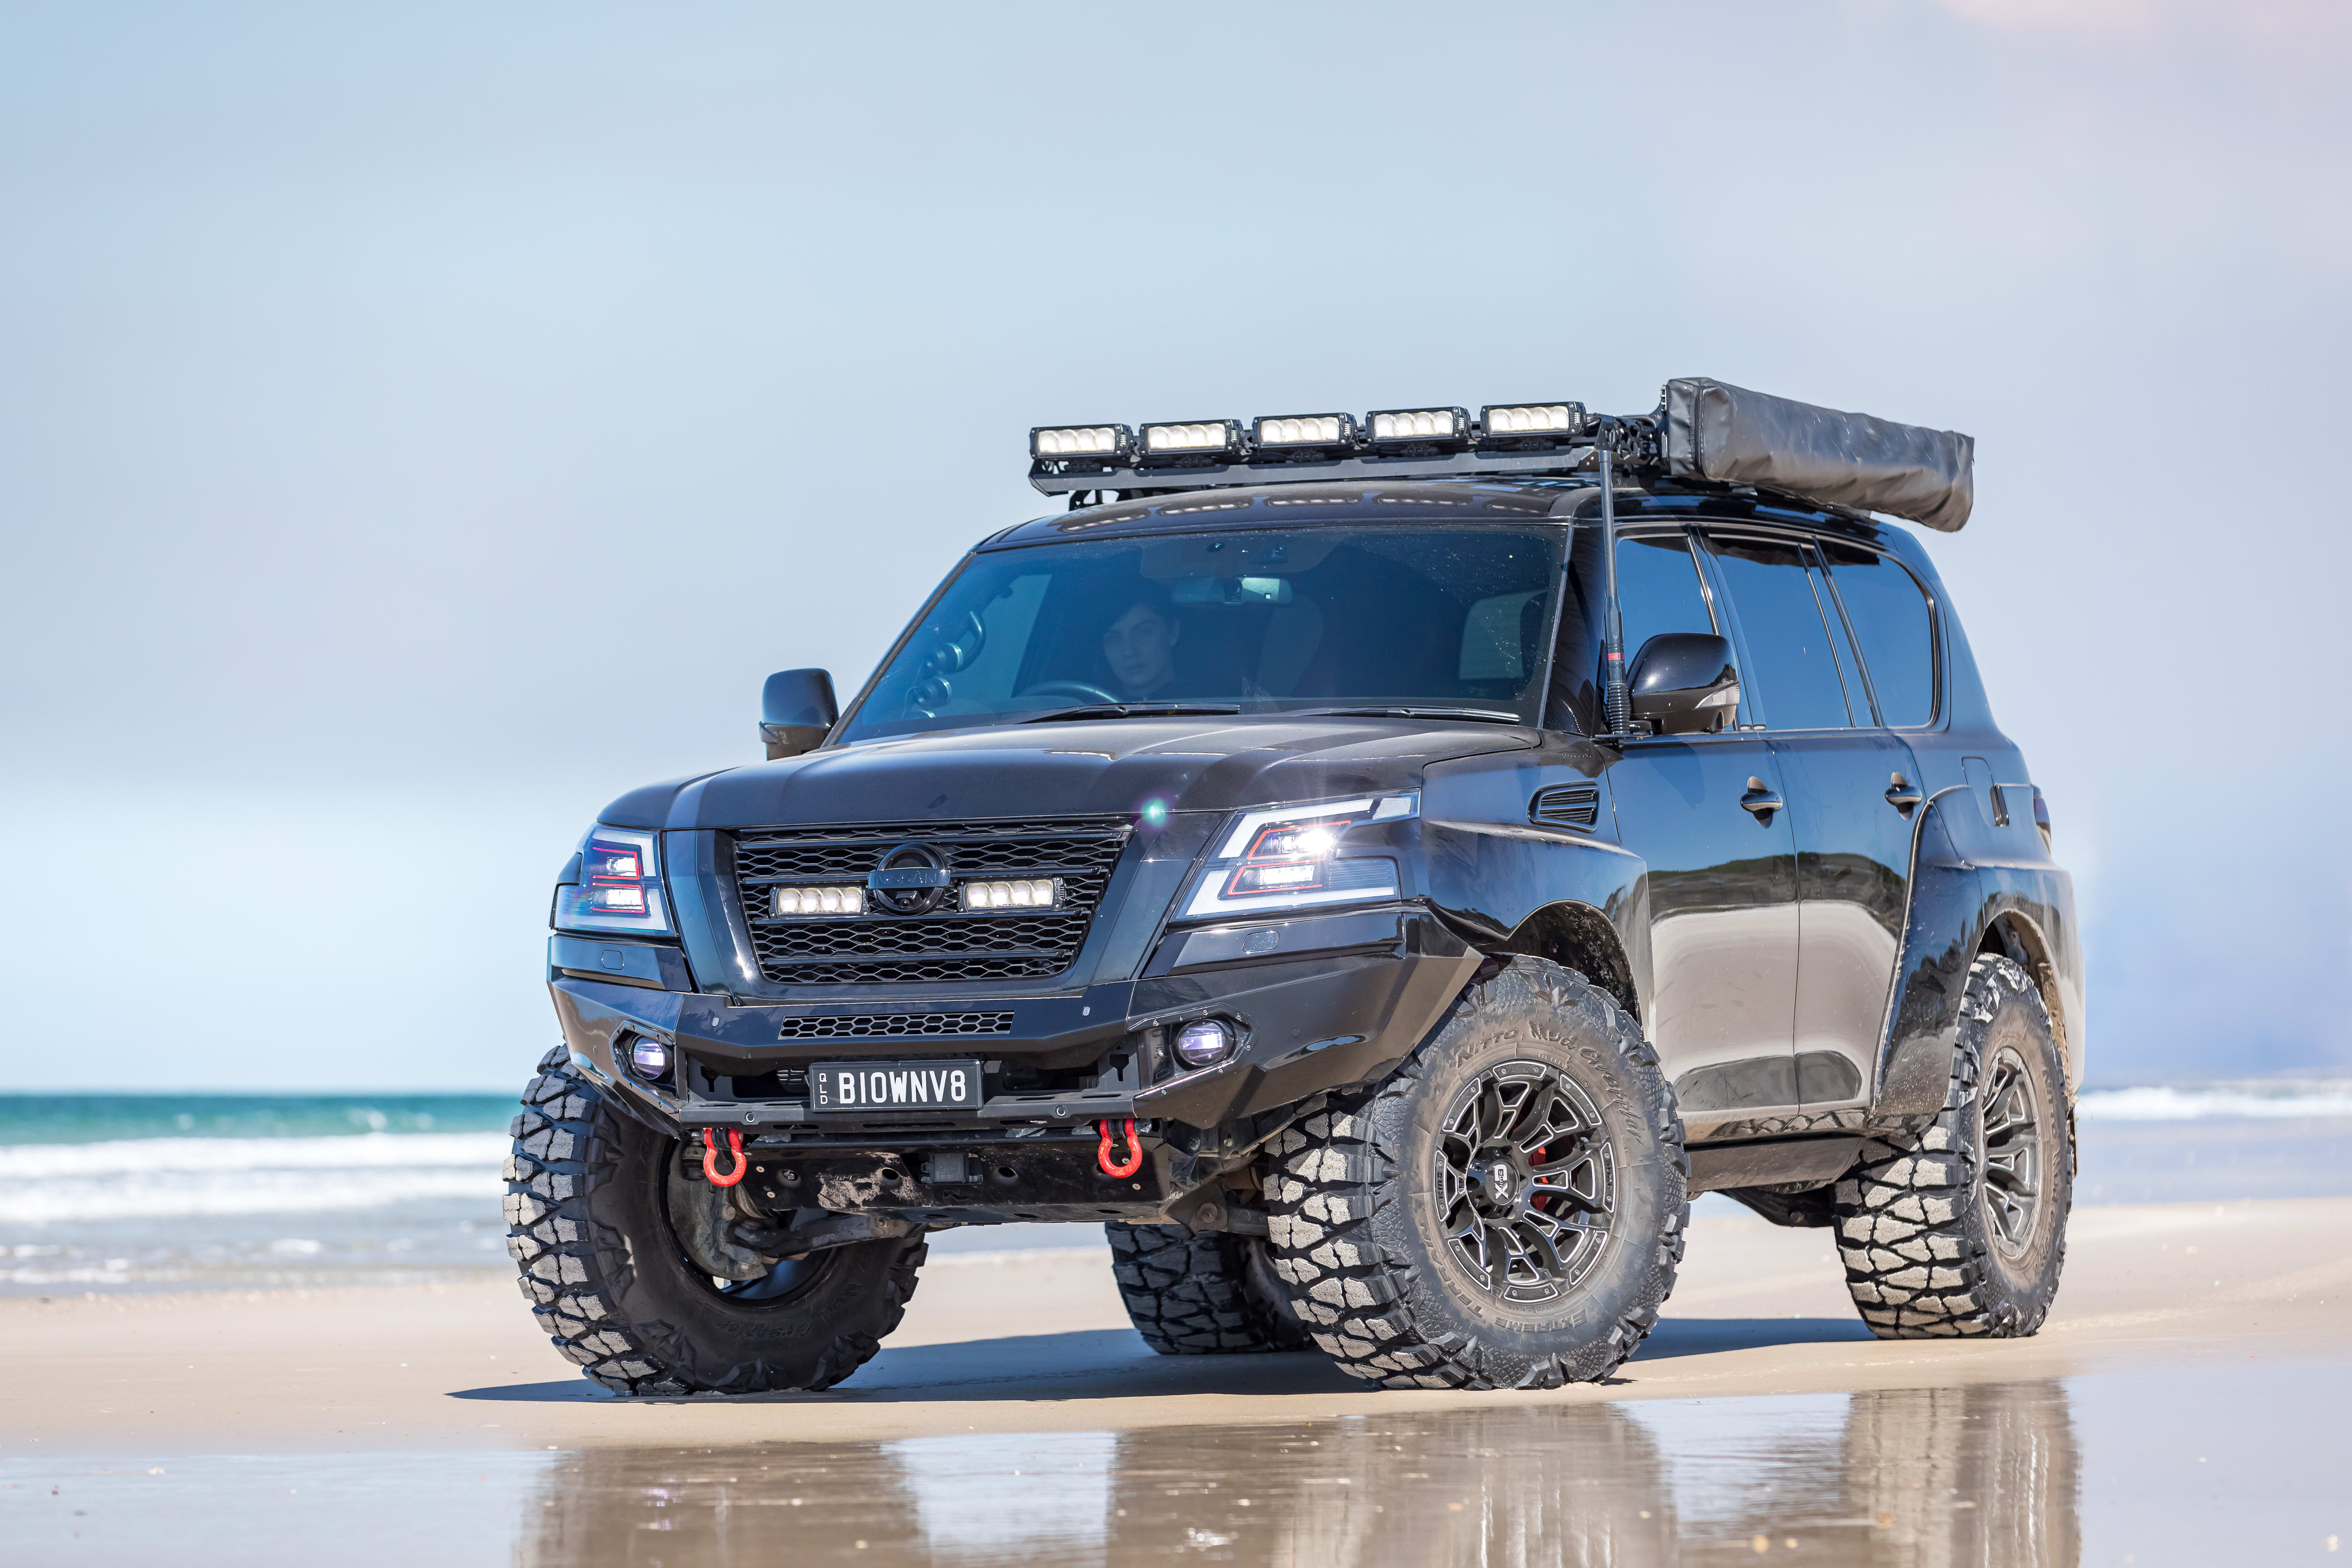 4 X 4 Australia Reviews 2021 September 2021 Custom Nissan Y 62 Patrol Beach 2